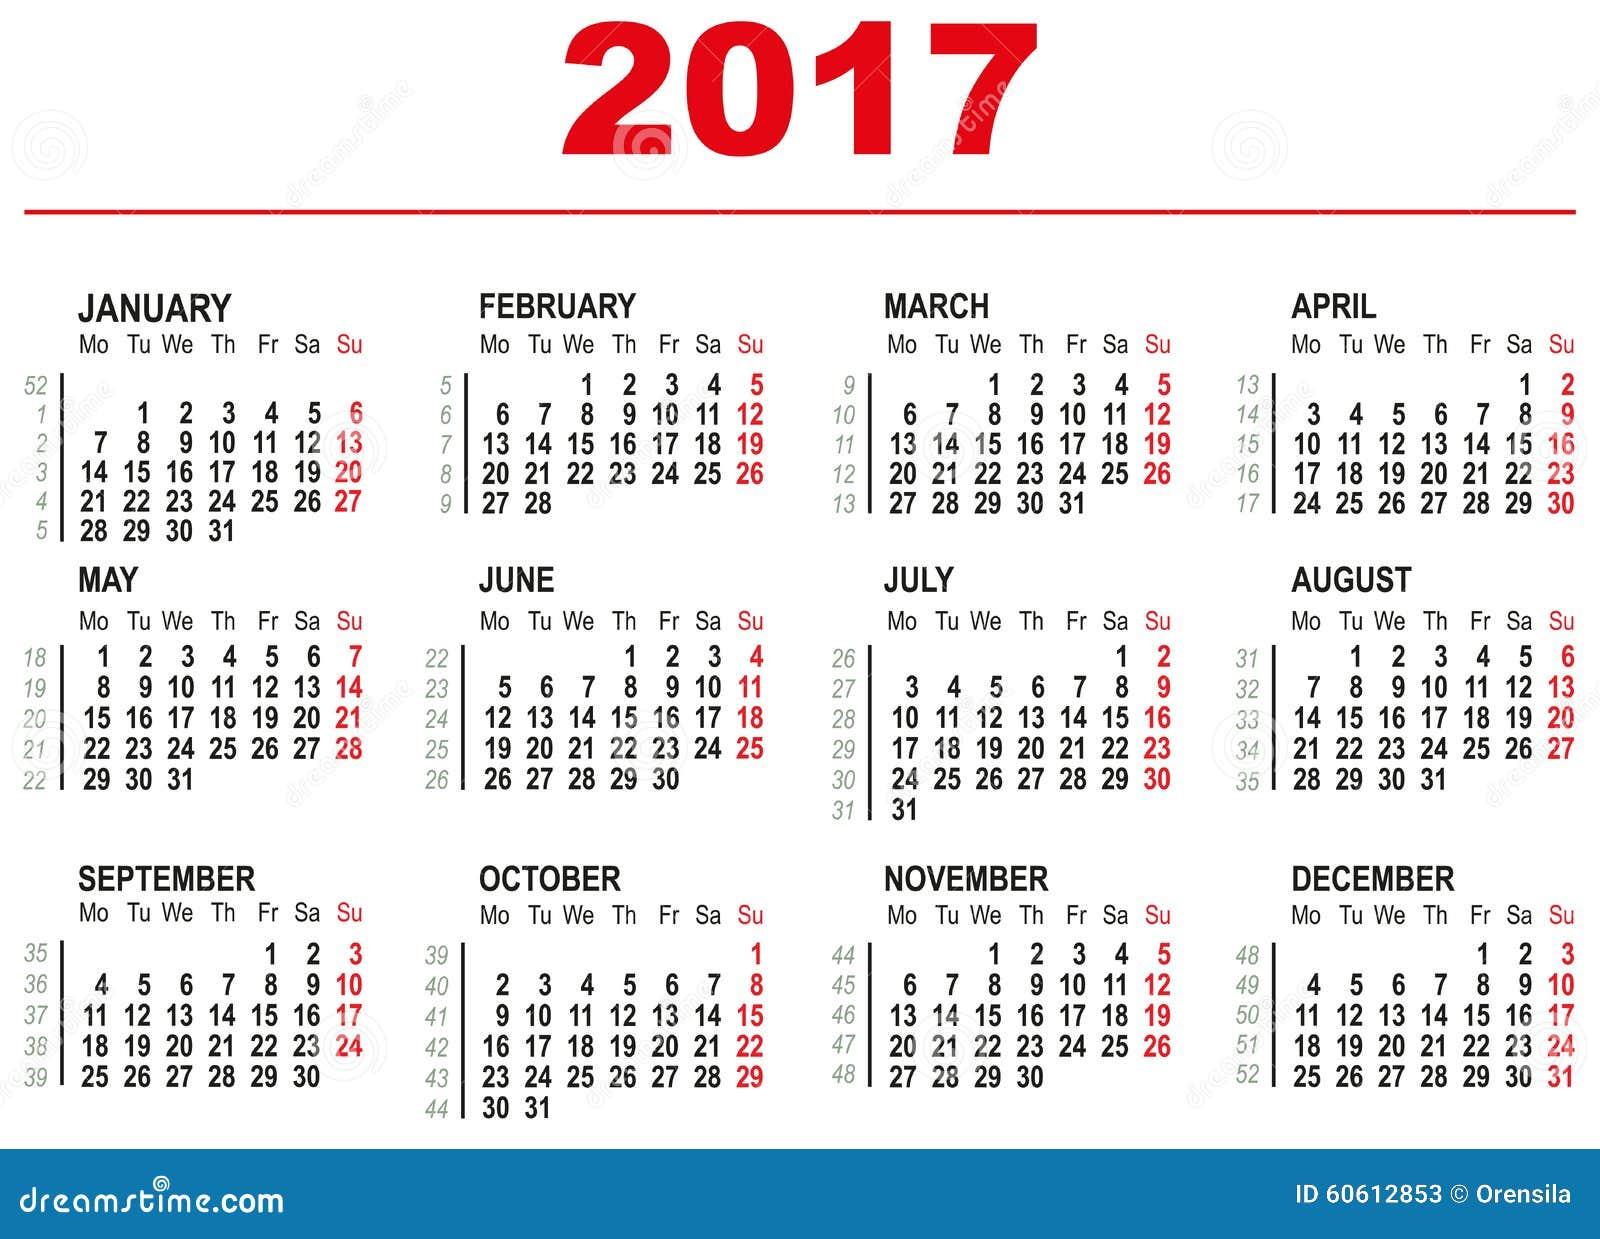 Calendario De Semanas.Plantilla De 2017 Calendarios Semanas Horizontales Primer Dia Lunes